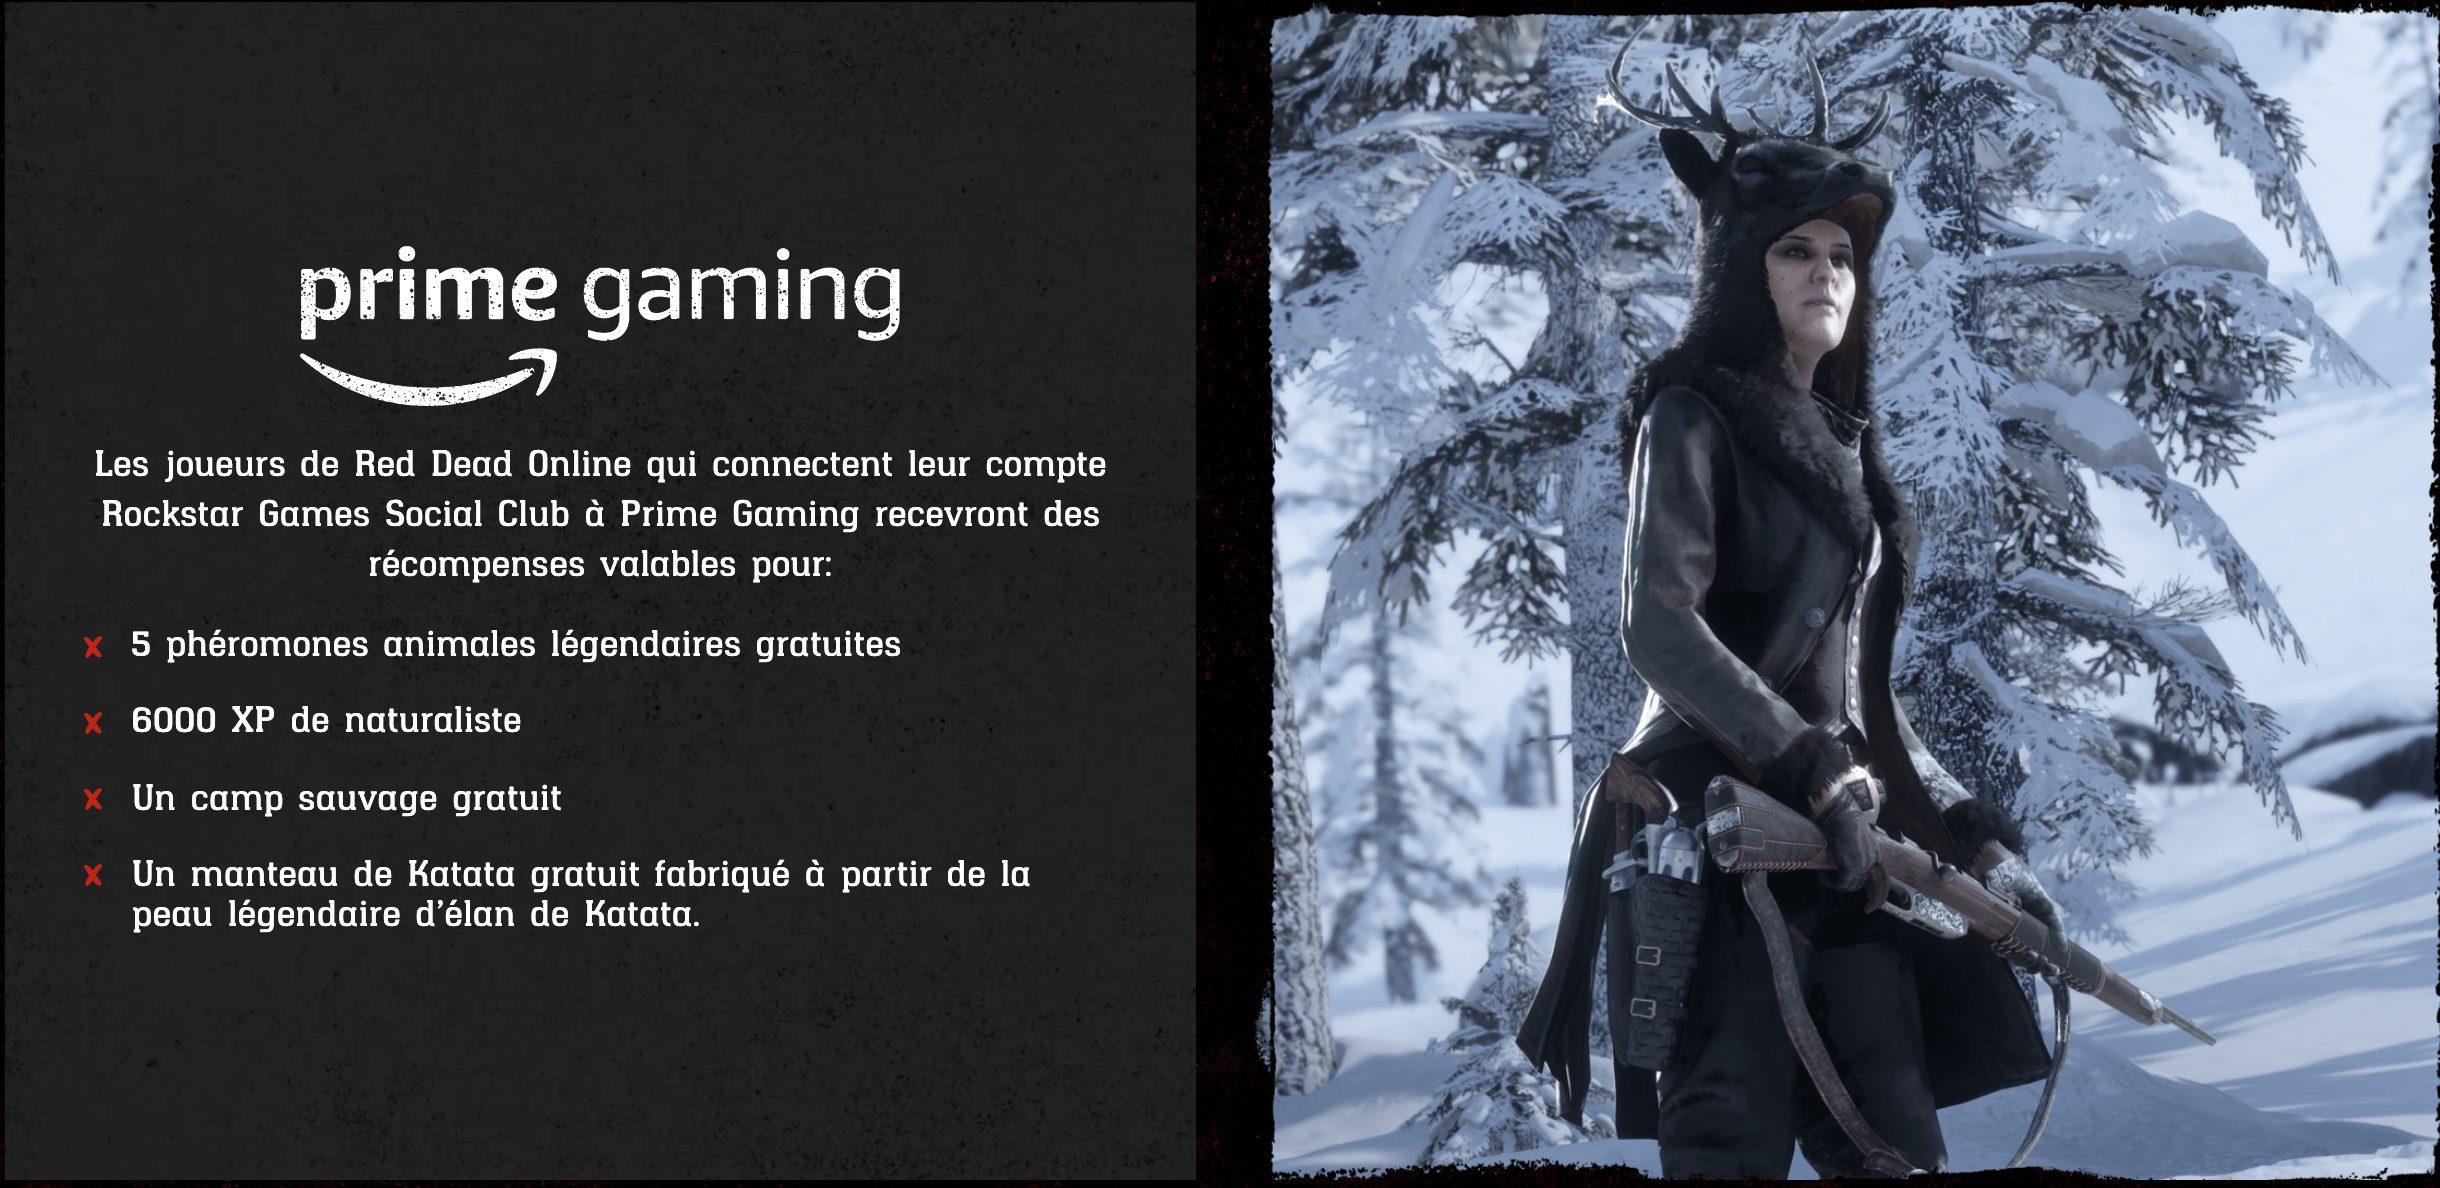 Red Dead Online Prime Gaming 3 Novembre